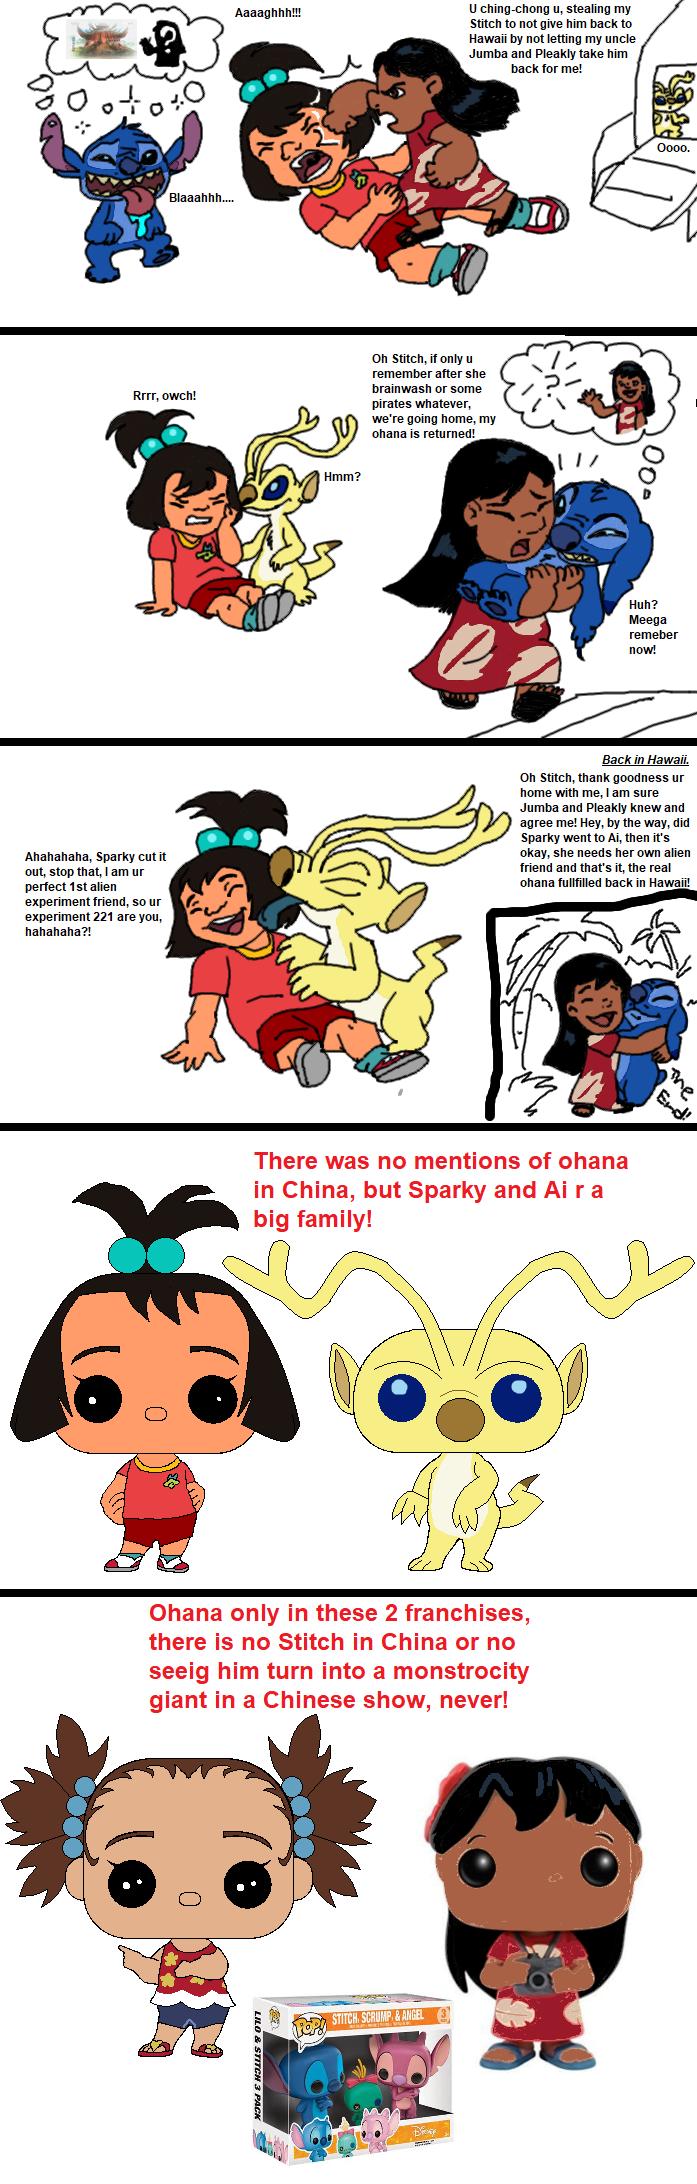 Stitch comes back to Lilo finally by Kottylingual